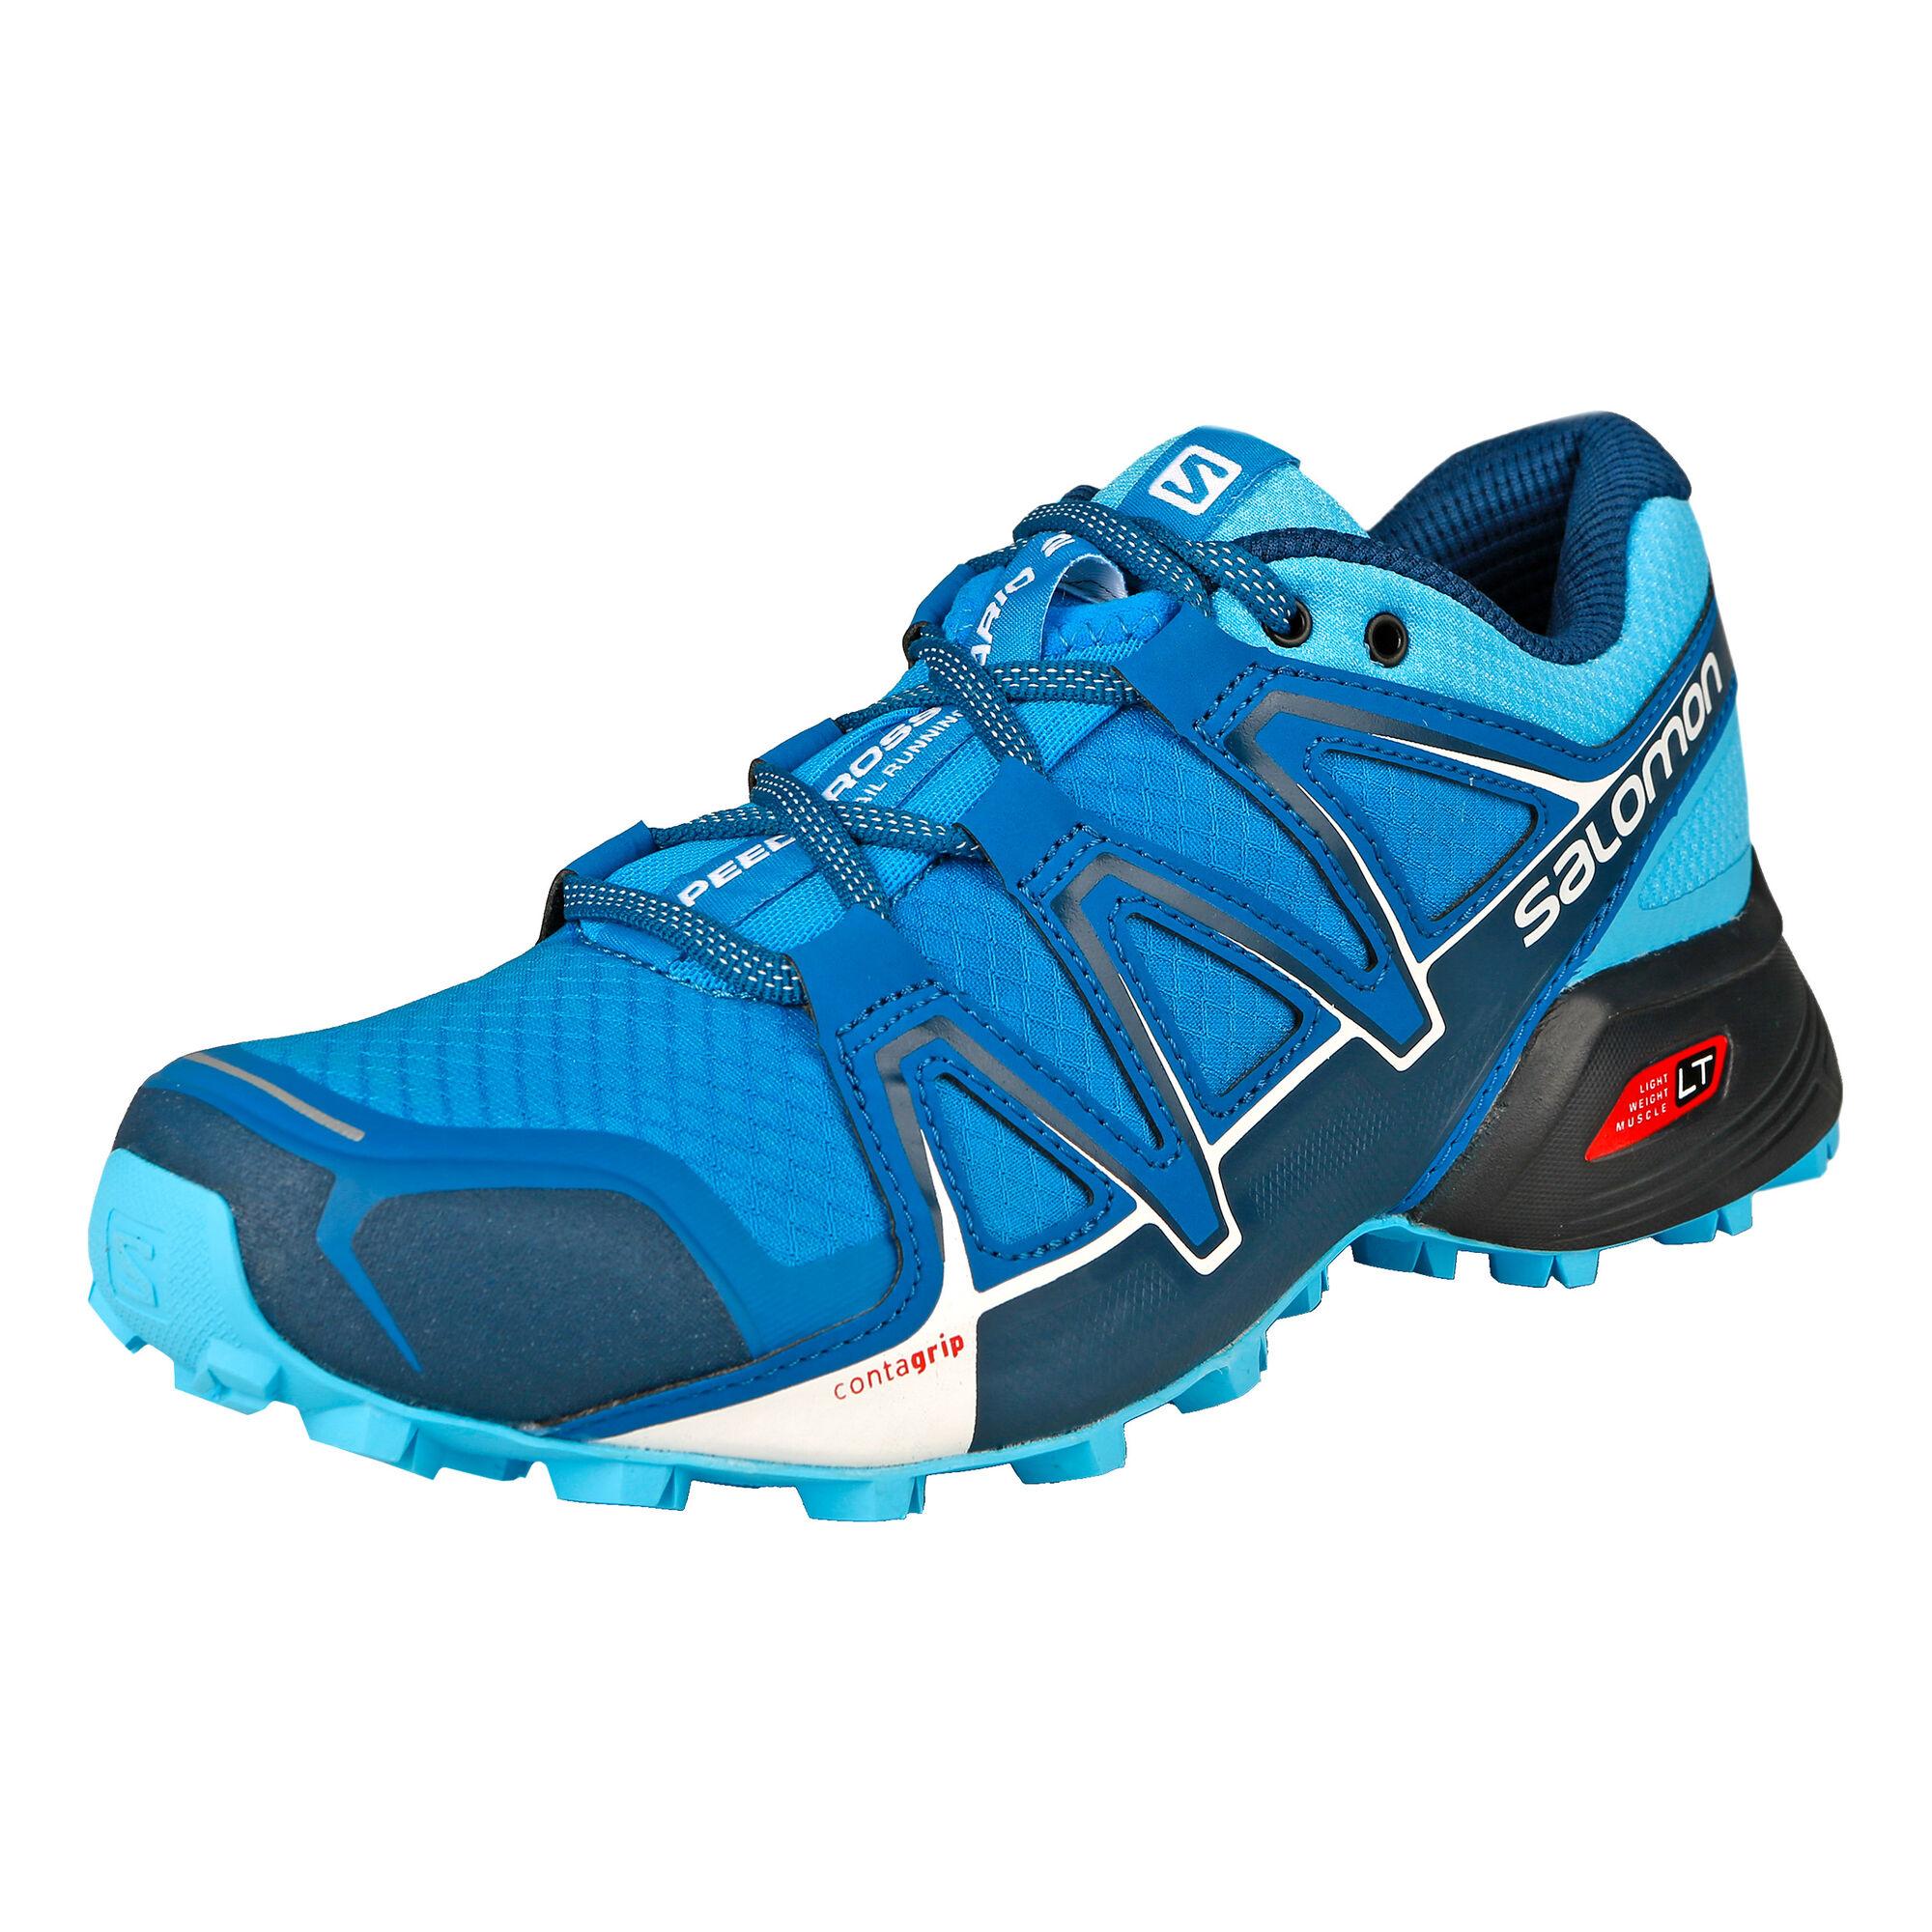 8e3f497b052f buy Salomon Speedcross Vario 2 Trail Running Shoe Women - Blue ...